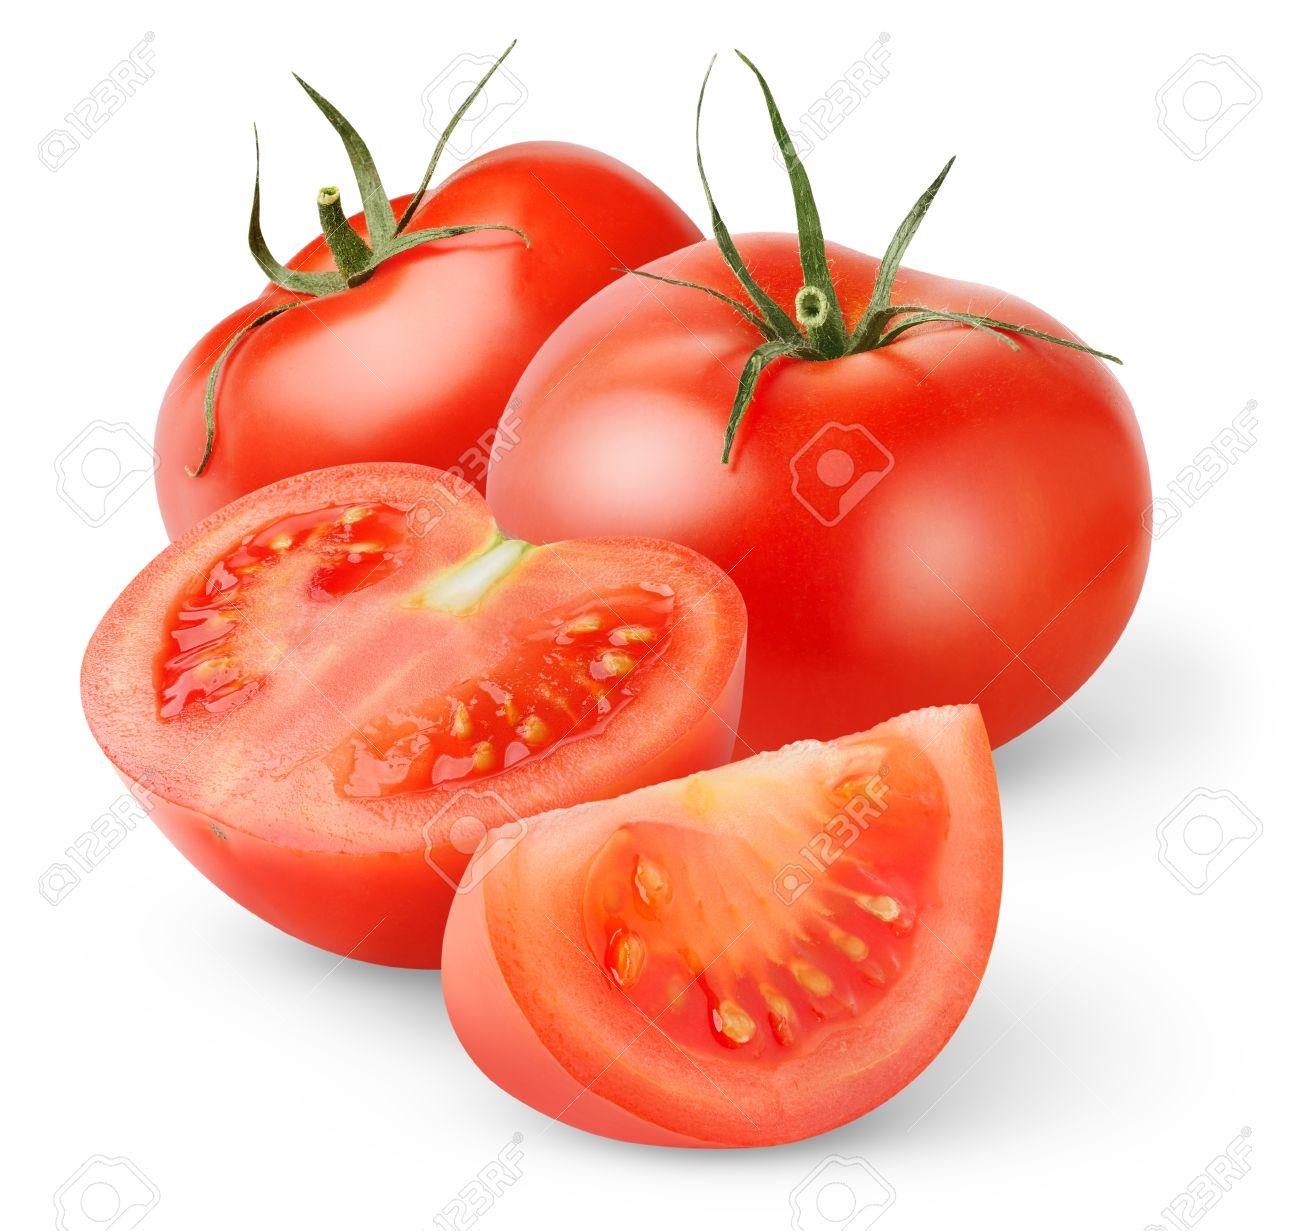 Fresh tomatoes isolated on white - 8475276